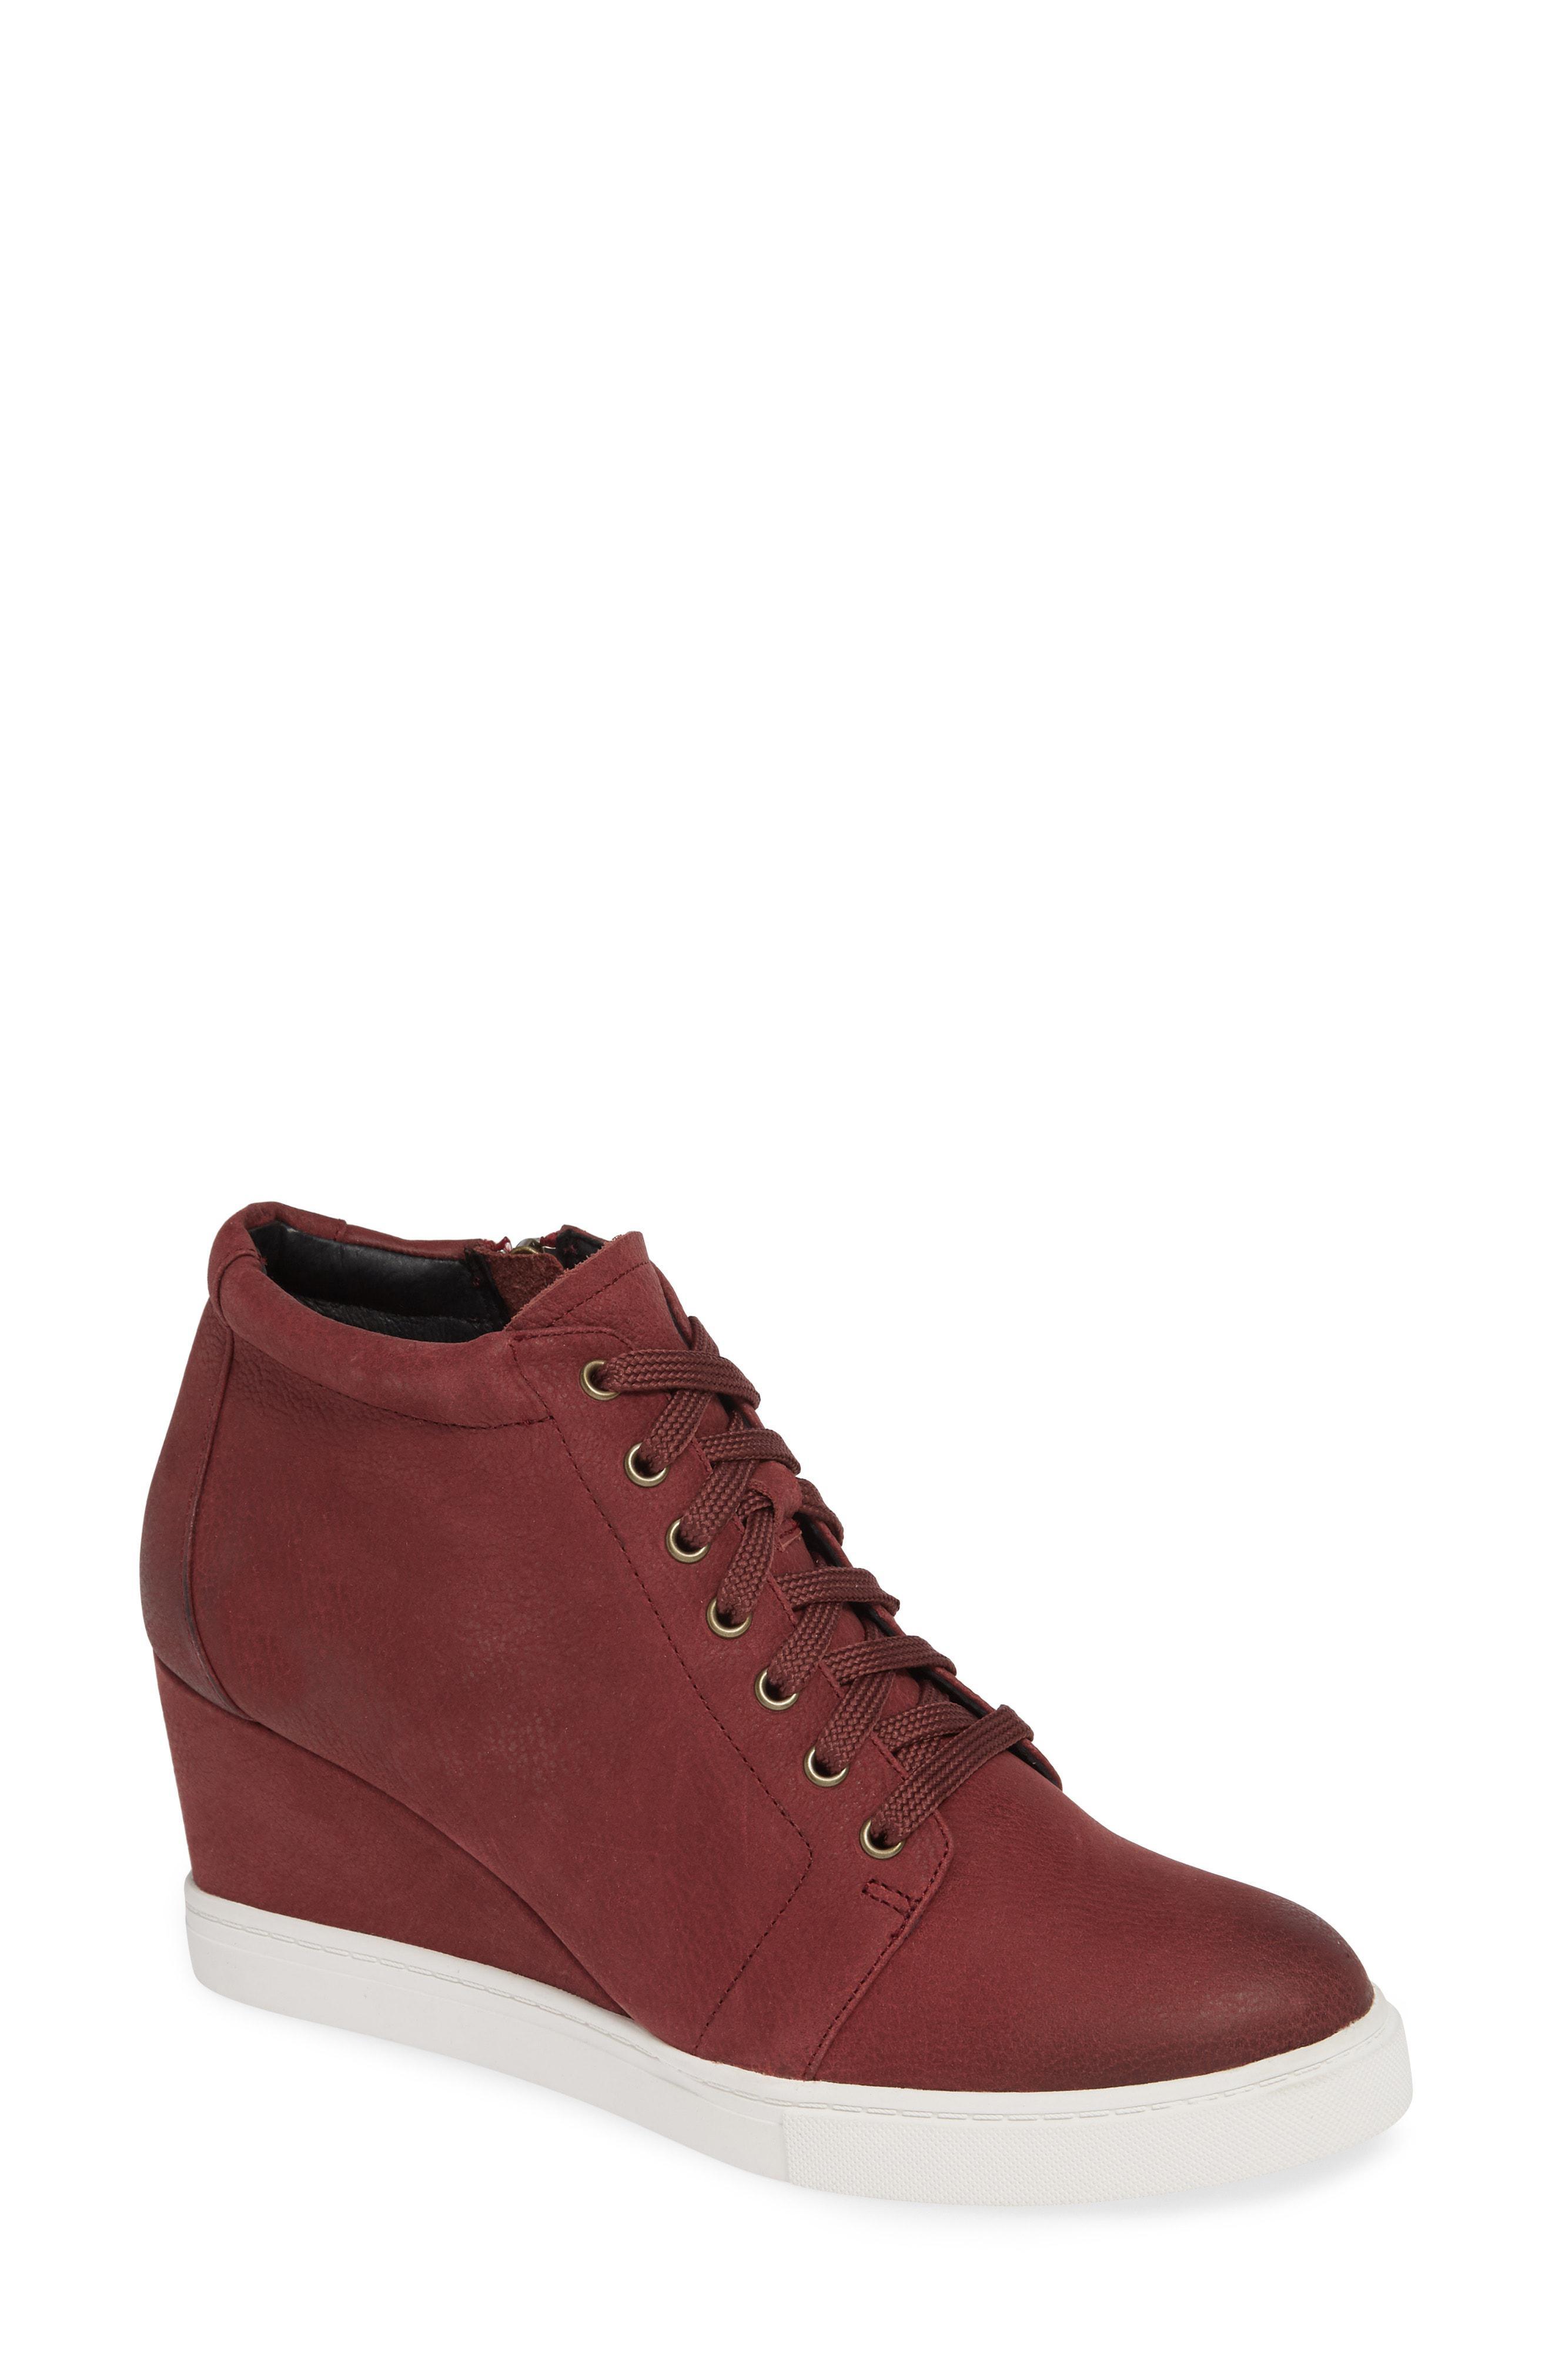 2c68f93dc48 Lyst - Caslon Caslon Axel Wedge Sneaker - Save 40%